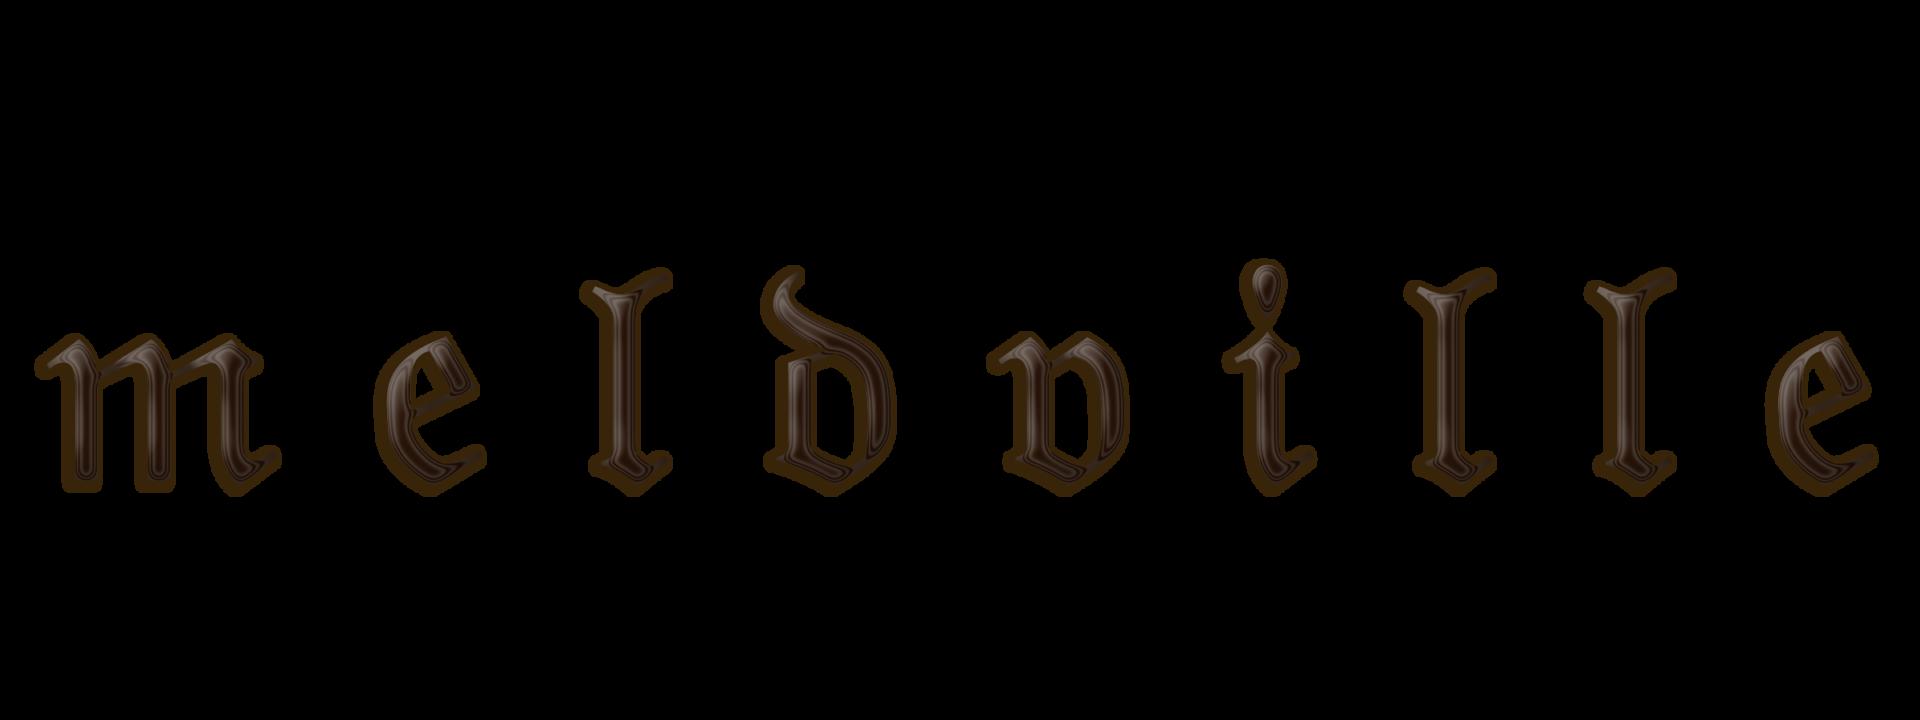 Meldville Wordmark